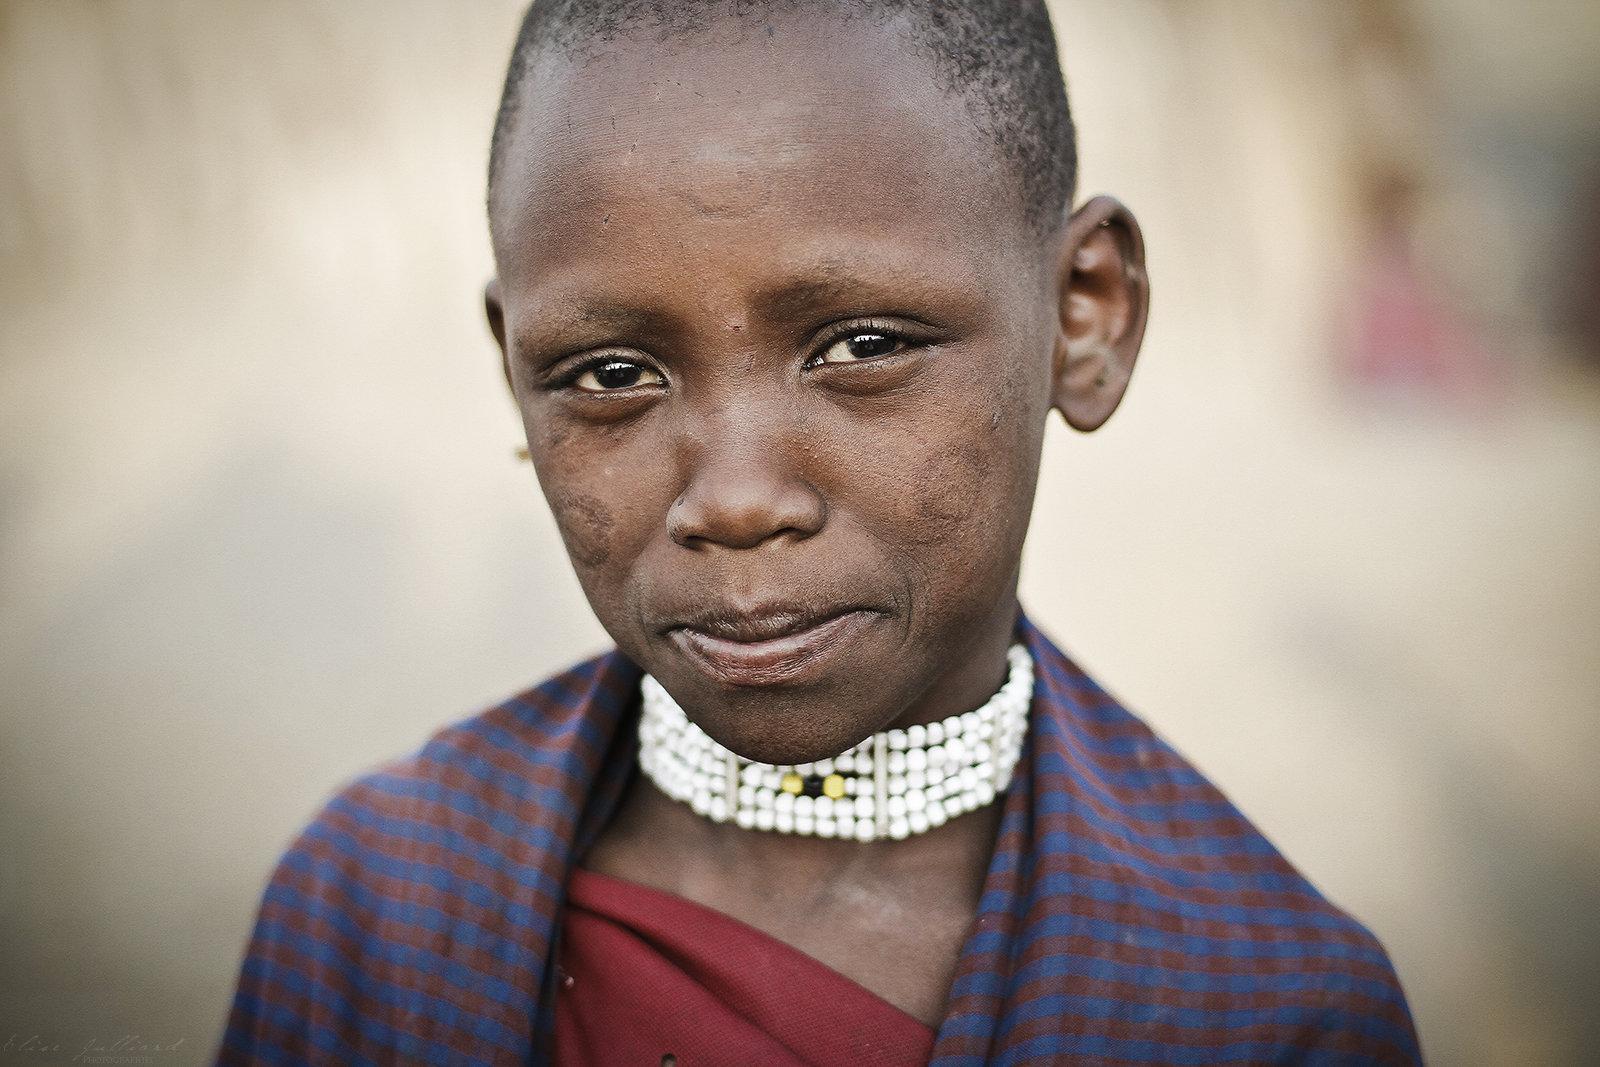 elise-julliard-photographe-jeune-maasai-lac-natron-tanzanie-afrique